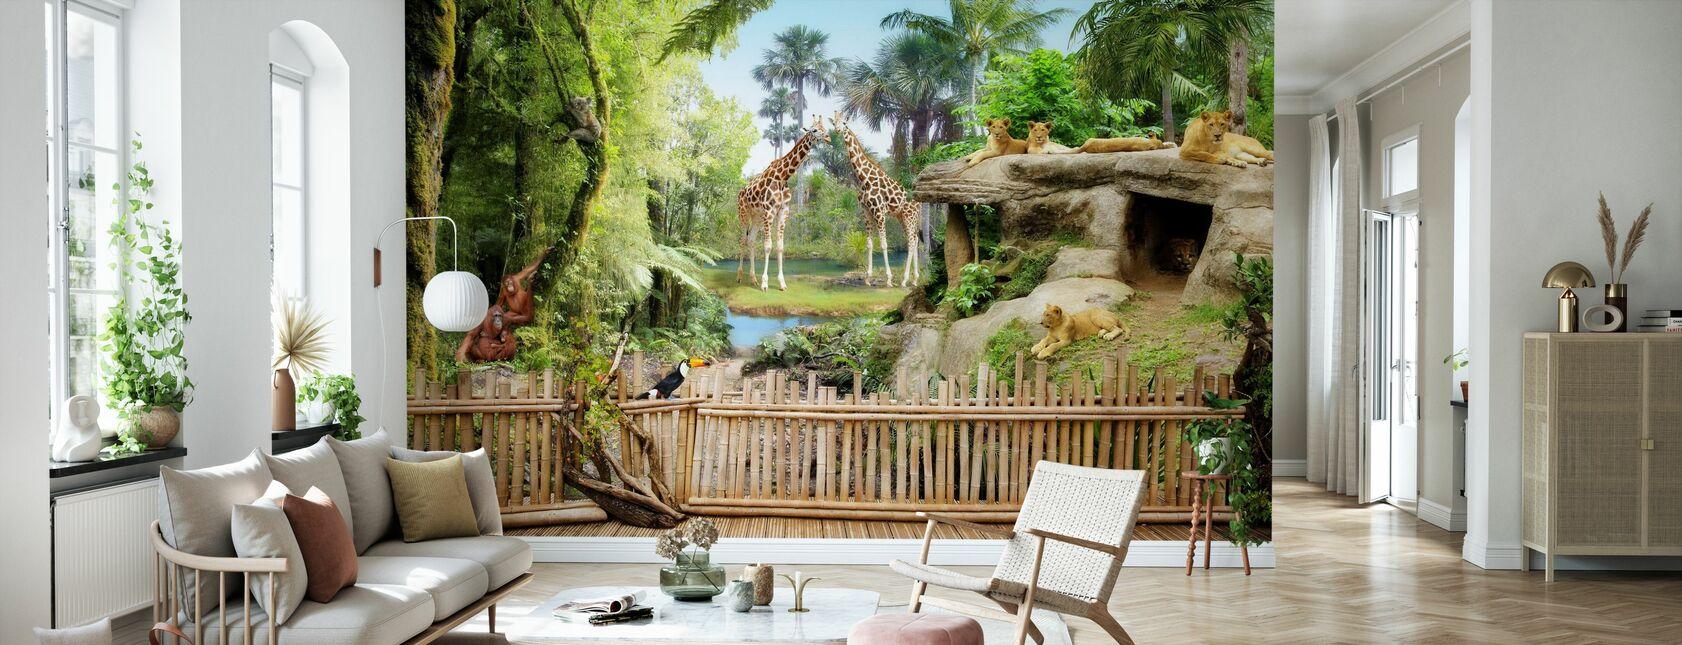 Zoo Animals - Wallpaper - Living Room